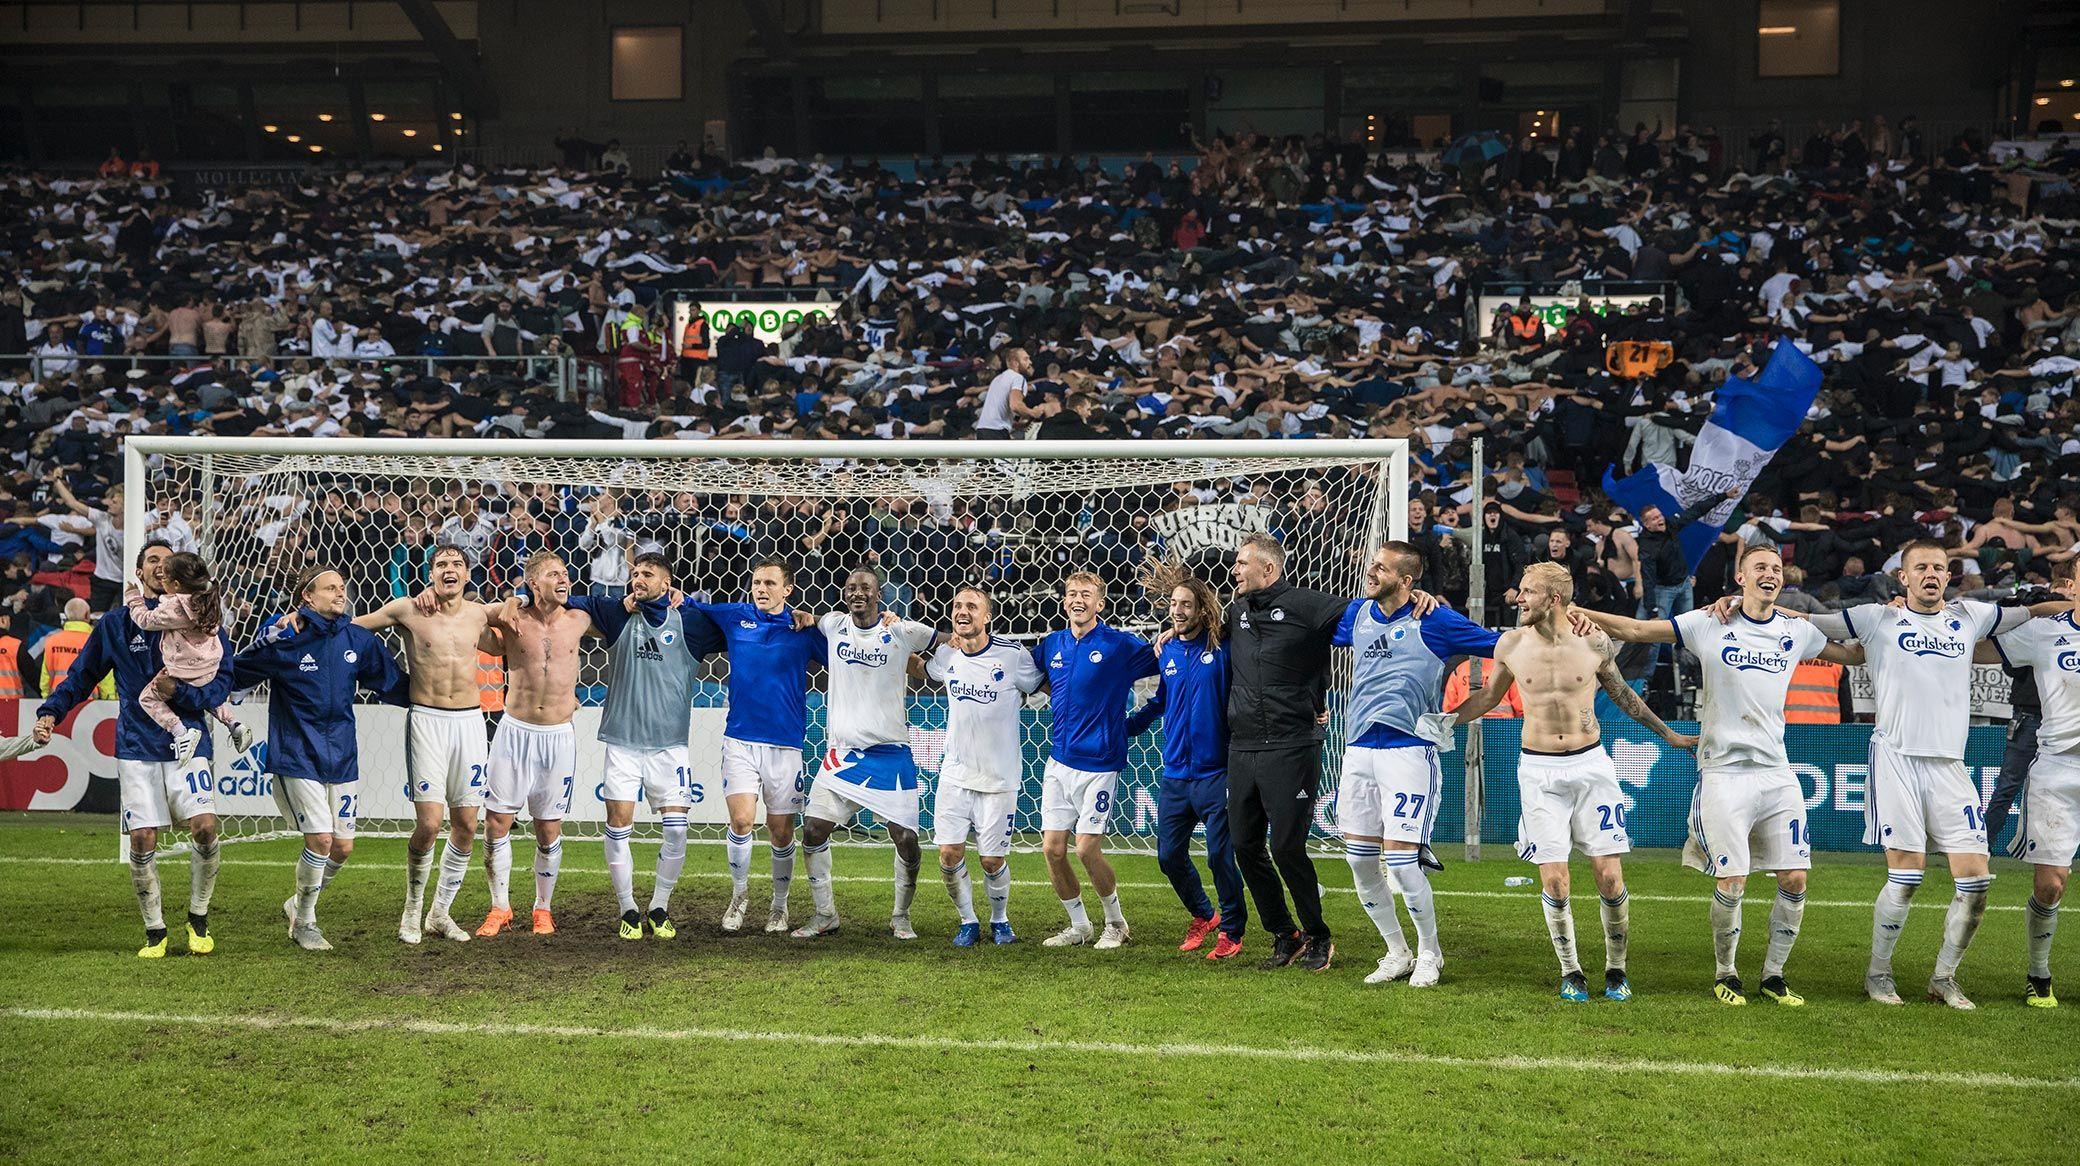 Europa League Draw Fck To Play Zenit Bordeaux And Slavia Prague